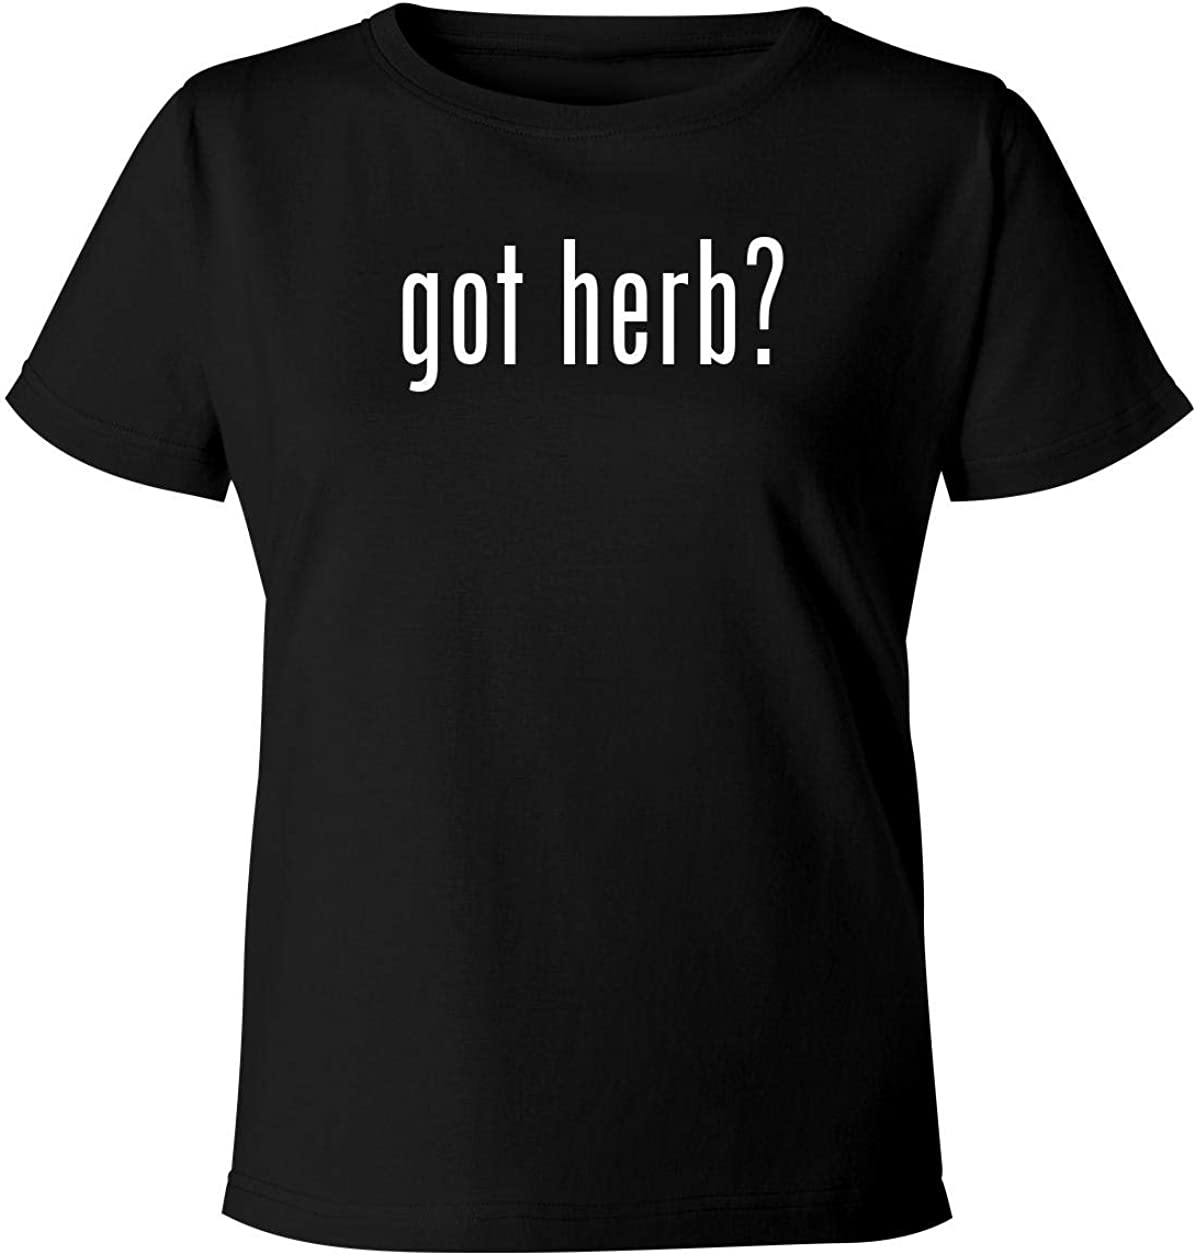 got herb? - Women's Soft & Comfortable Misses Cut T-Shirt